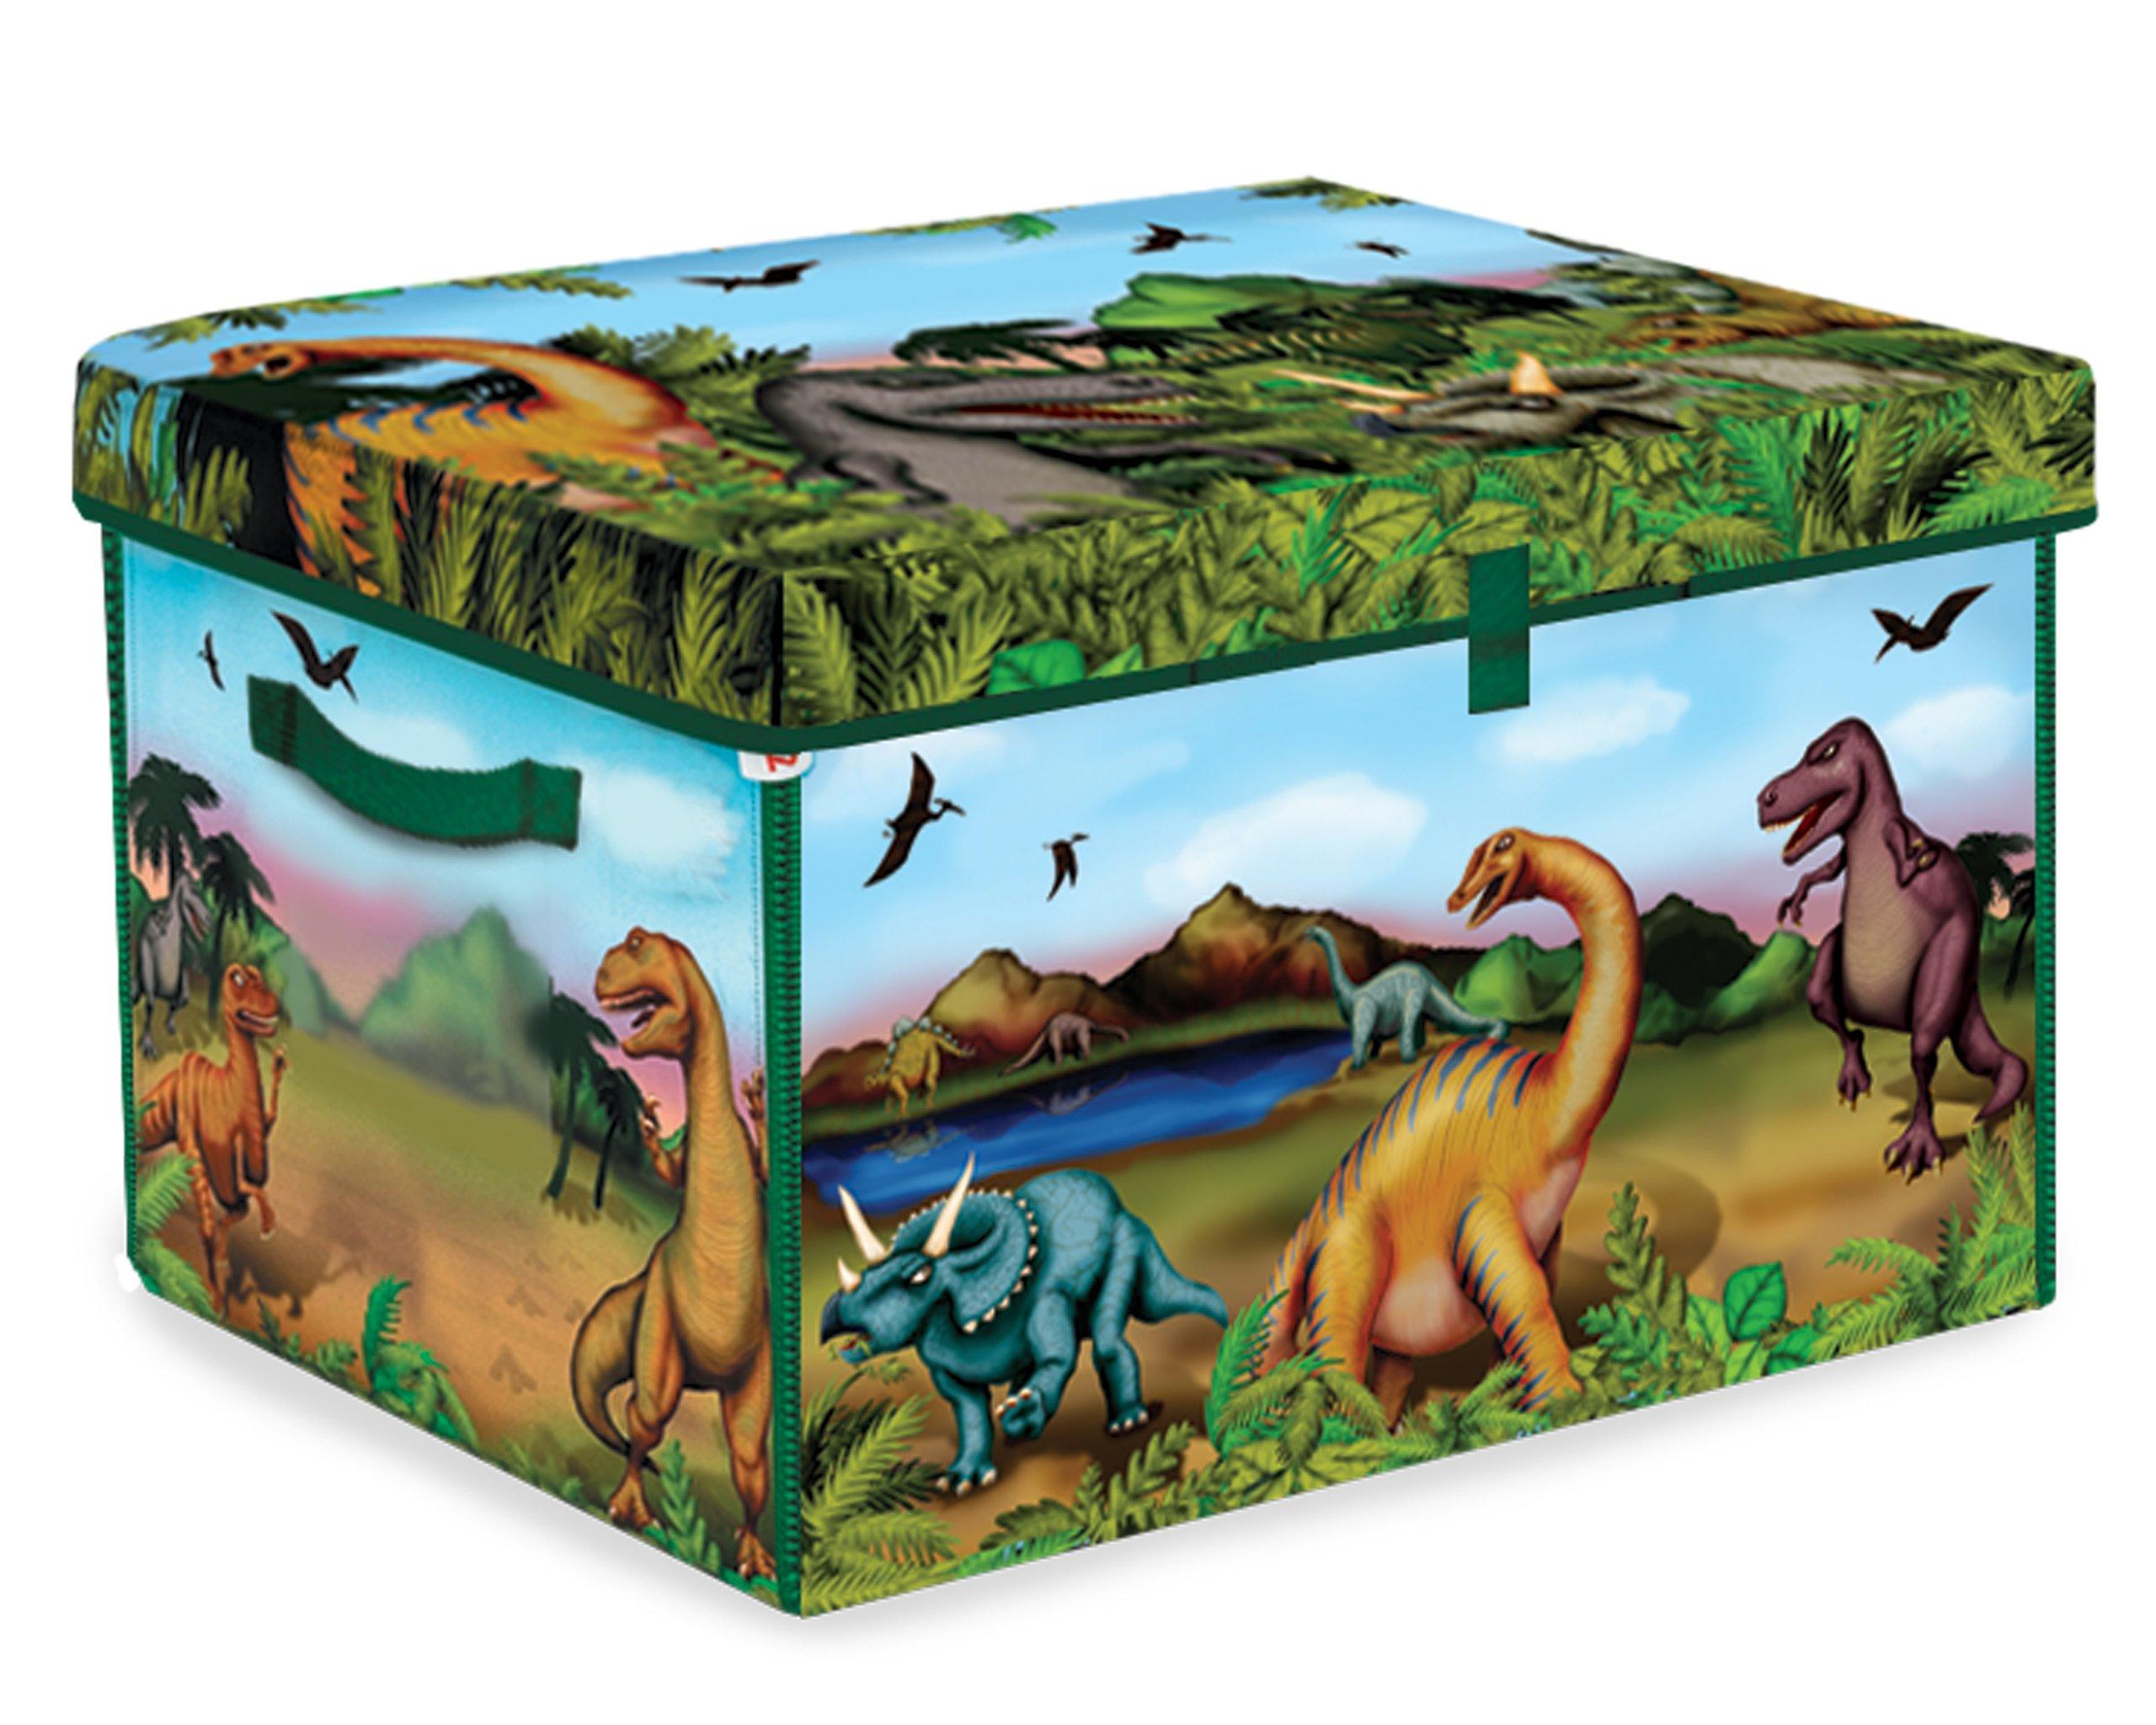 ZipBin 160 Dinosaur Collector Toy Box & Play set w/2 Dinosaurs